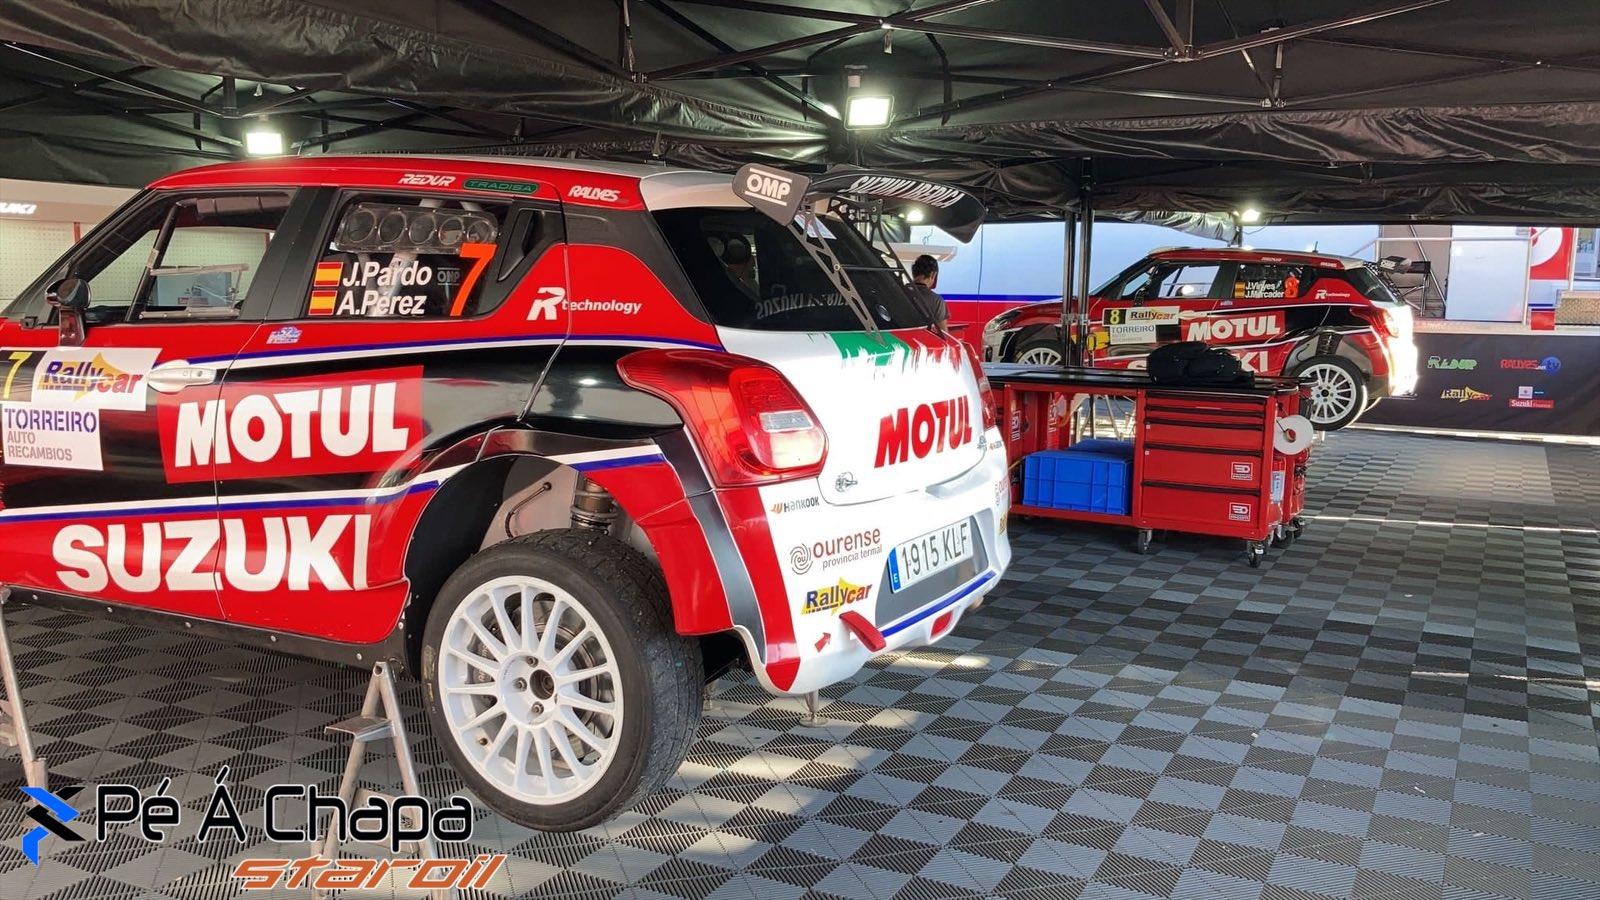 SCER + TER: 52º Rallye de Ferrol - Suzuki [20-21 Agosto] E9LFDeVWUBUiXay?format=jpg&name=large